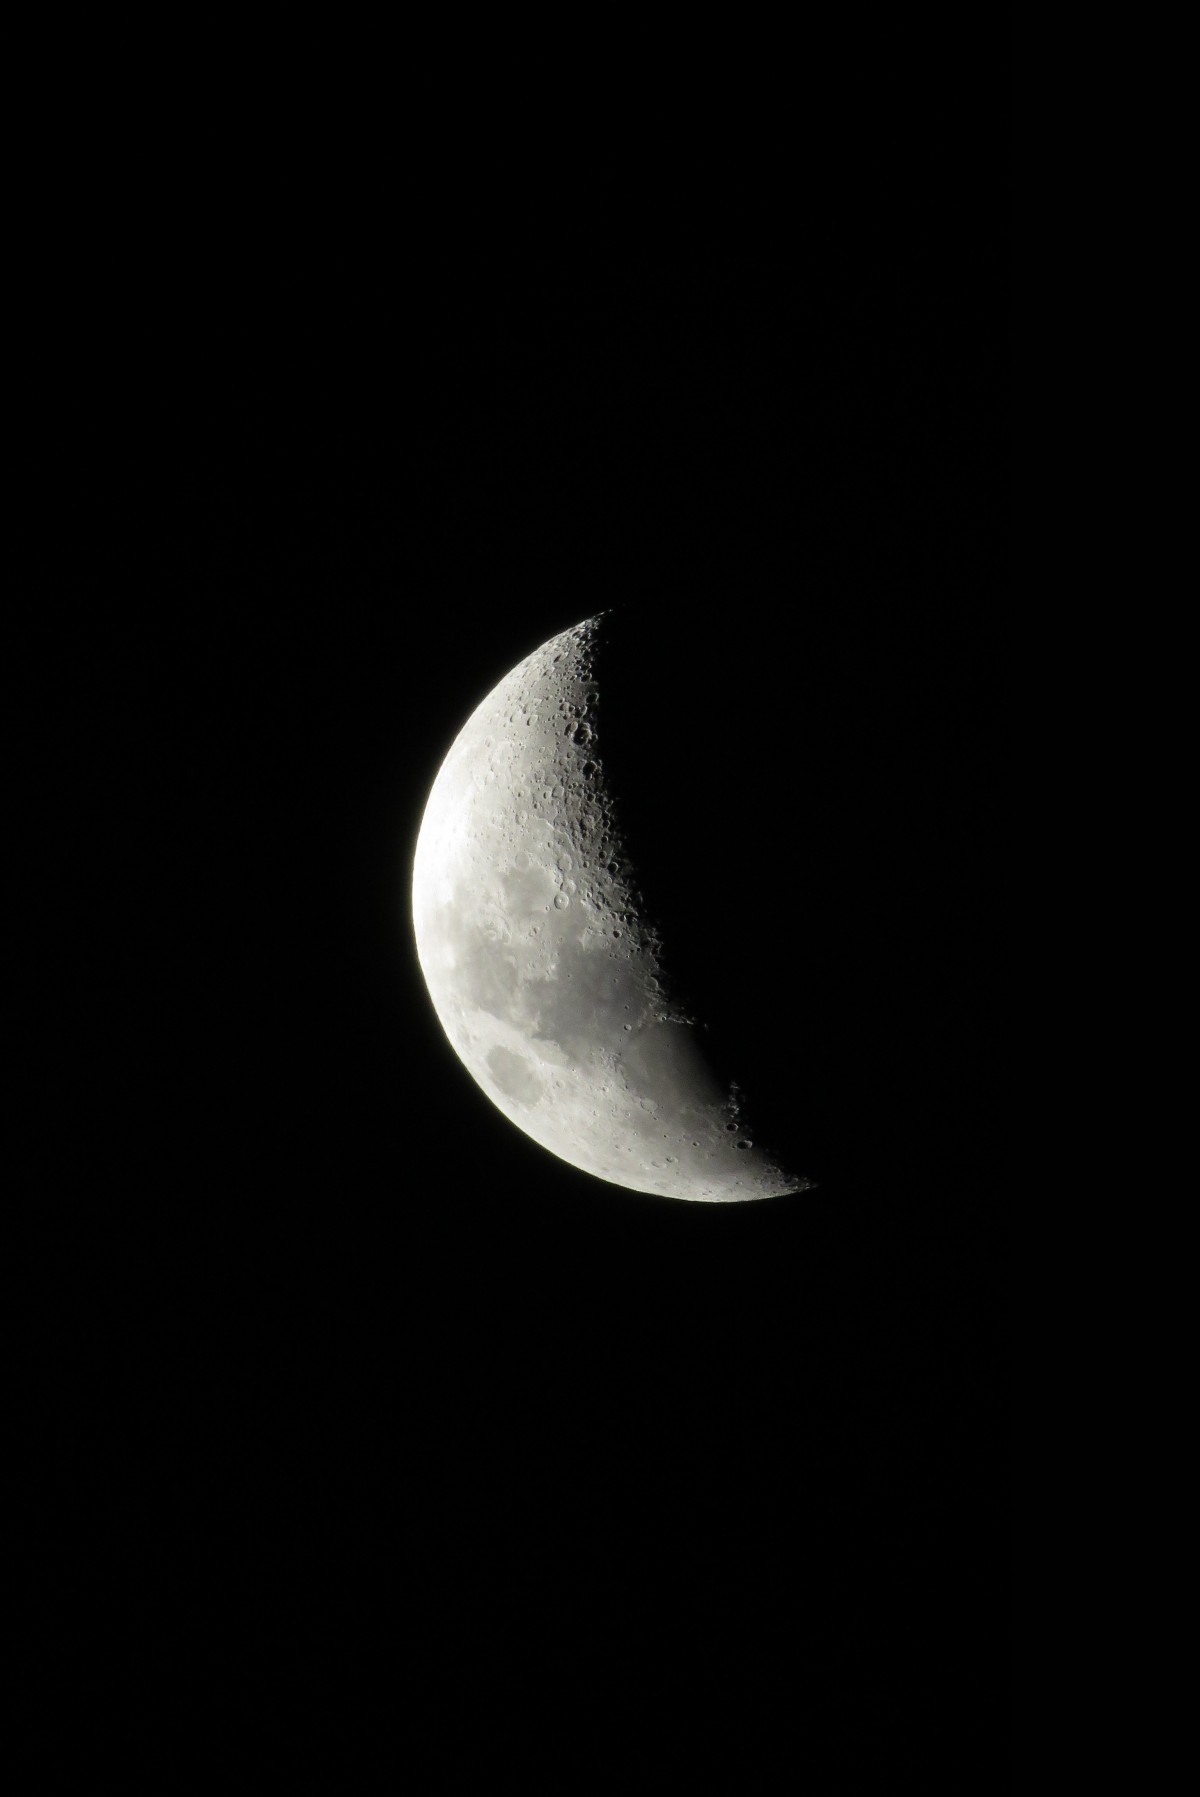 Gambar Bulan Hitam Putih : gambar, bulan, hitam, putih, Gambar, Hitam, Putih,, Malam,, Suasana,, Kegelapan,, Sinar, Bulan,, Lingkaran,, Bulan, Sabit,, Objek, Astronomi, 3077x4608, 599130, Galeri, PxHere